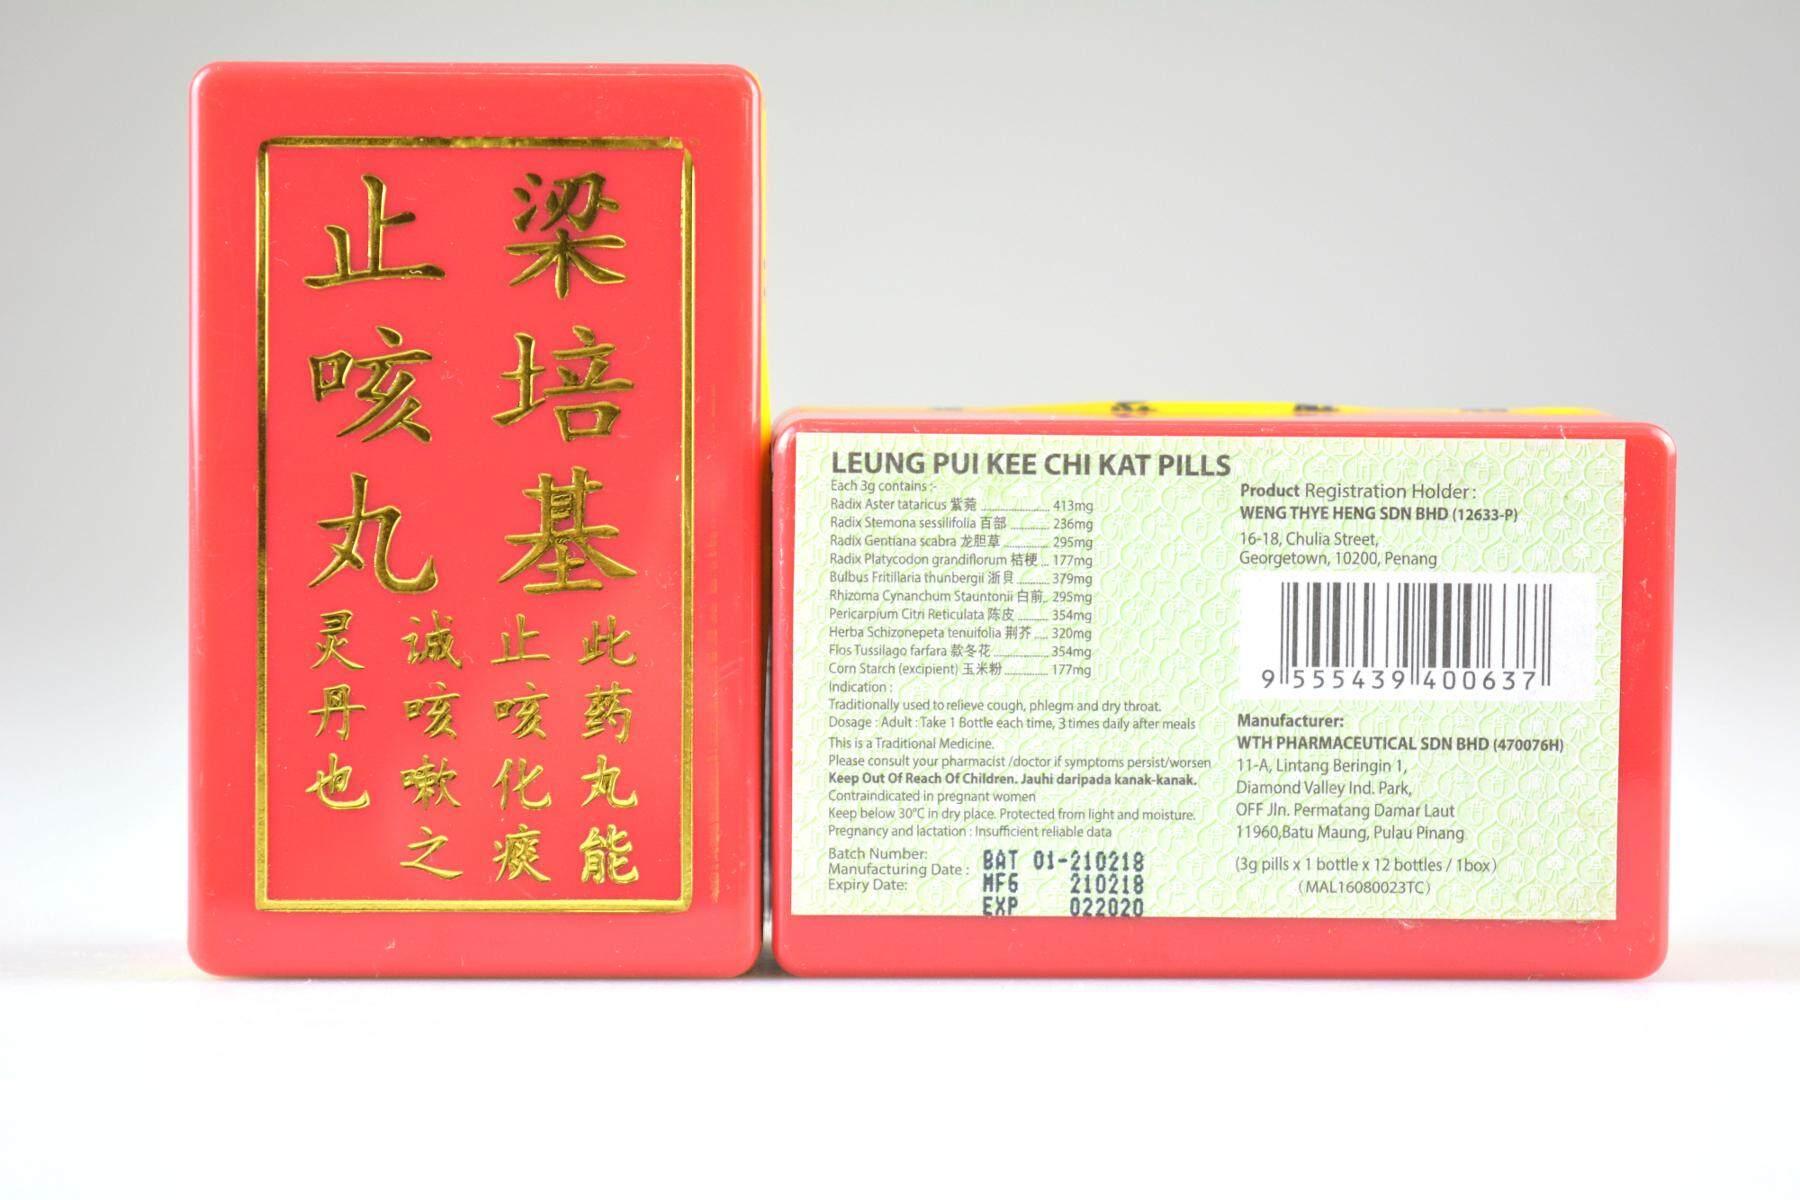 Leung pui kee chi kat pills 1 box x 12 bottle